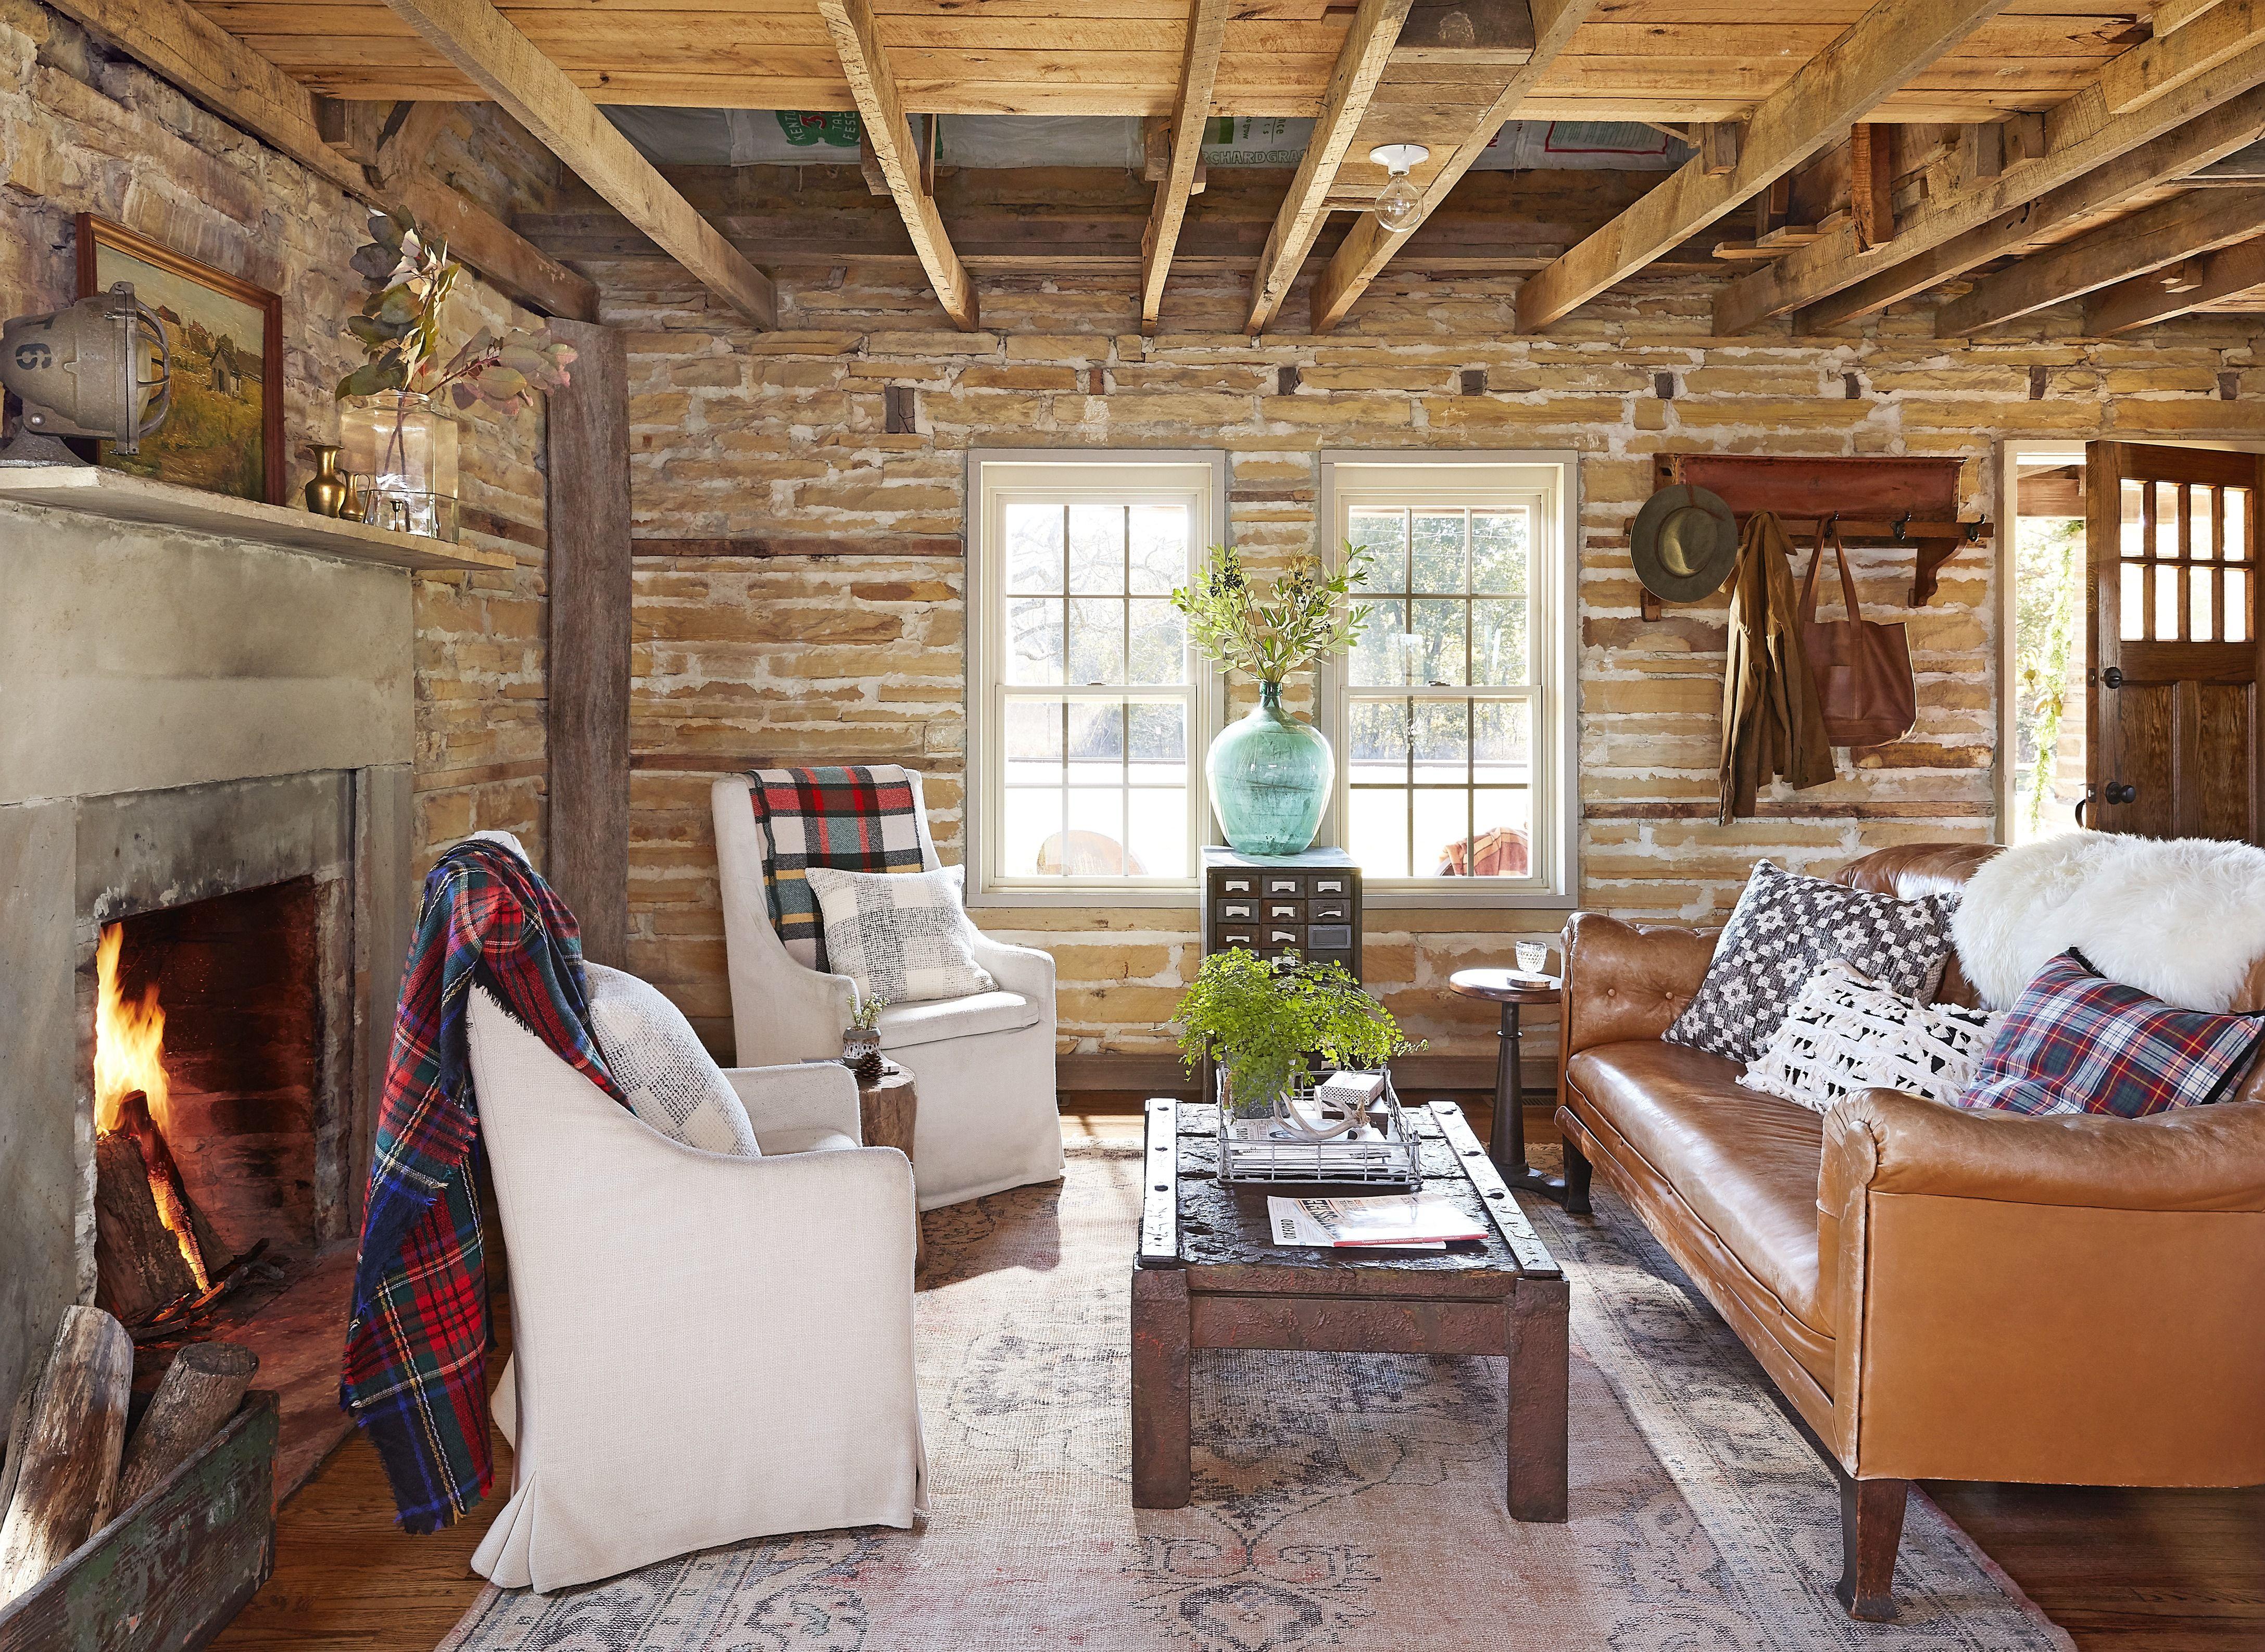 25 Rustic Living Room Ideas - Modern Rustic Living Room ... on Traditional Rustic Decor  id=47832